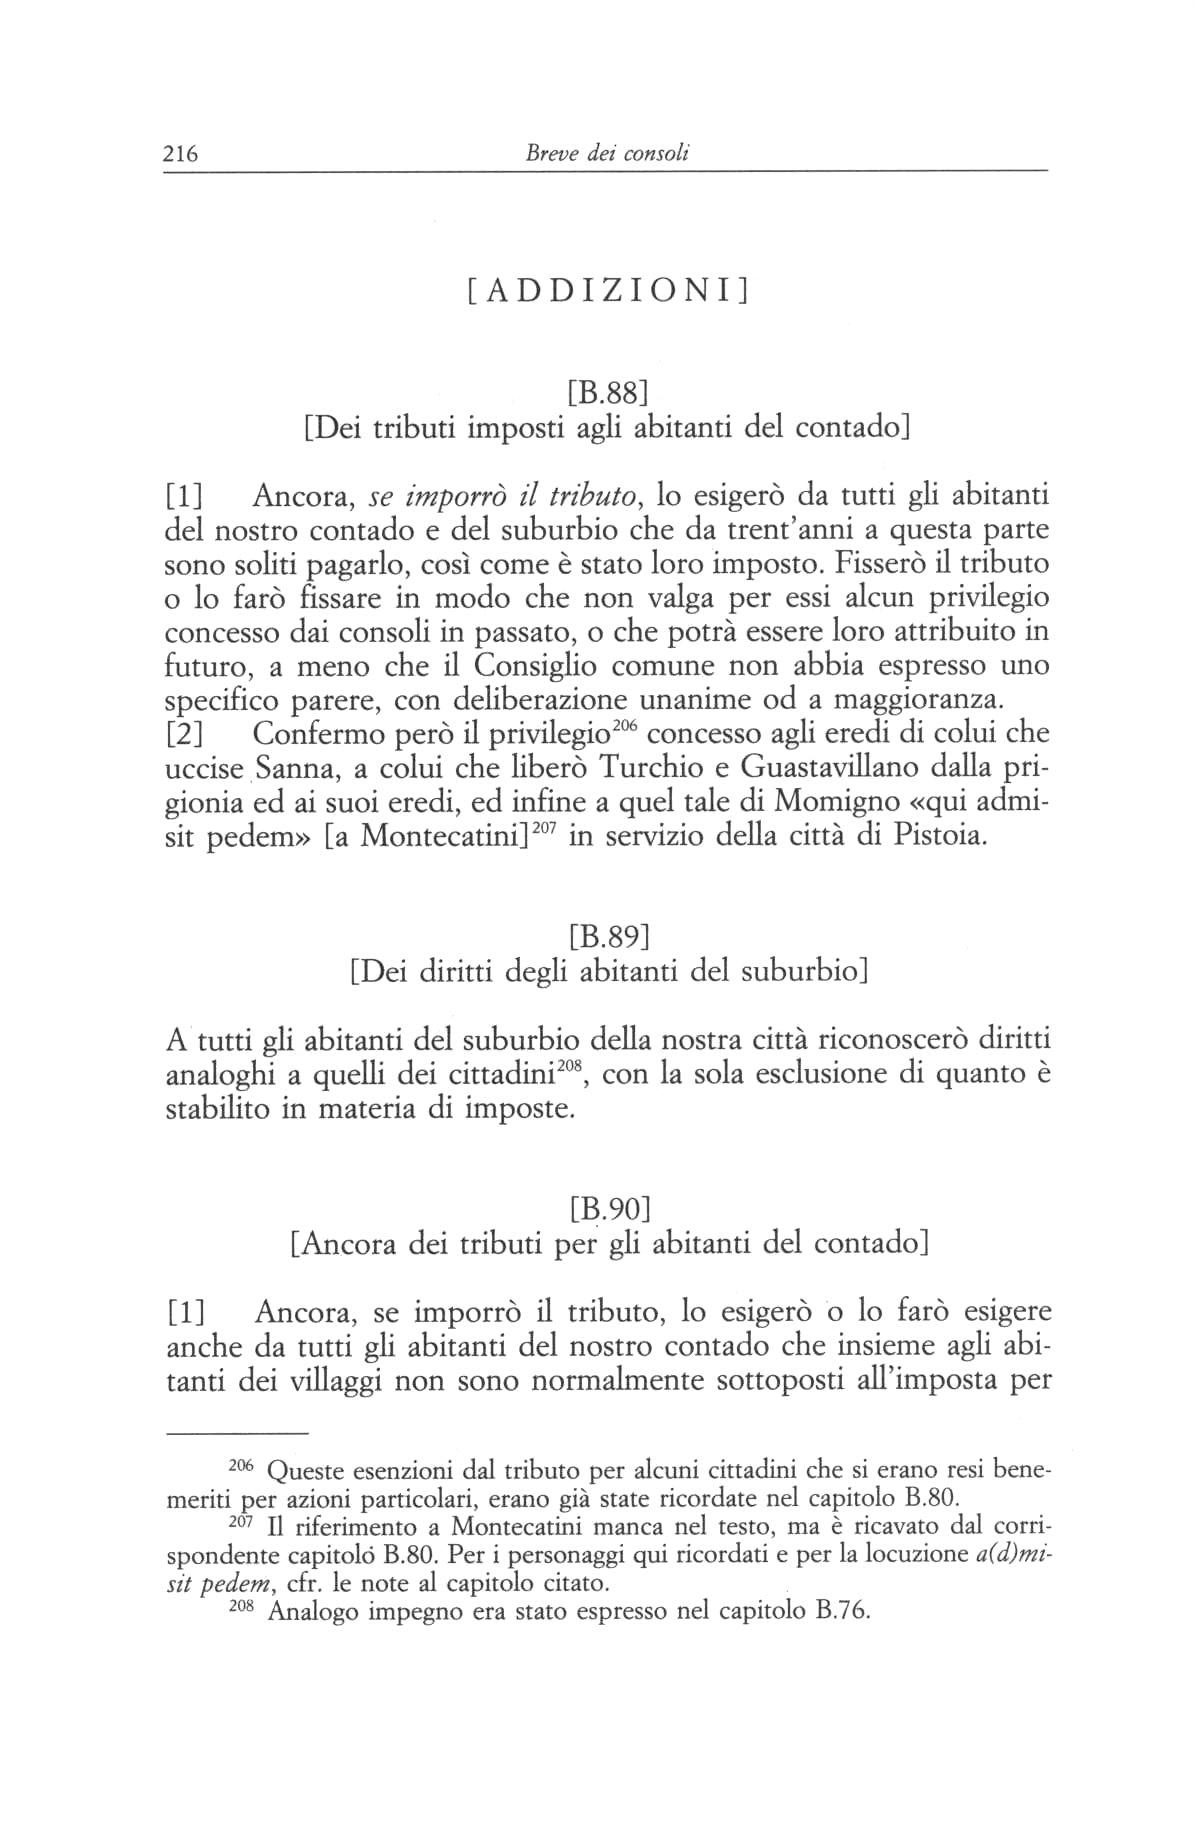 statuti pistoiesi del sec.XII 0216.jpg